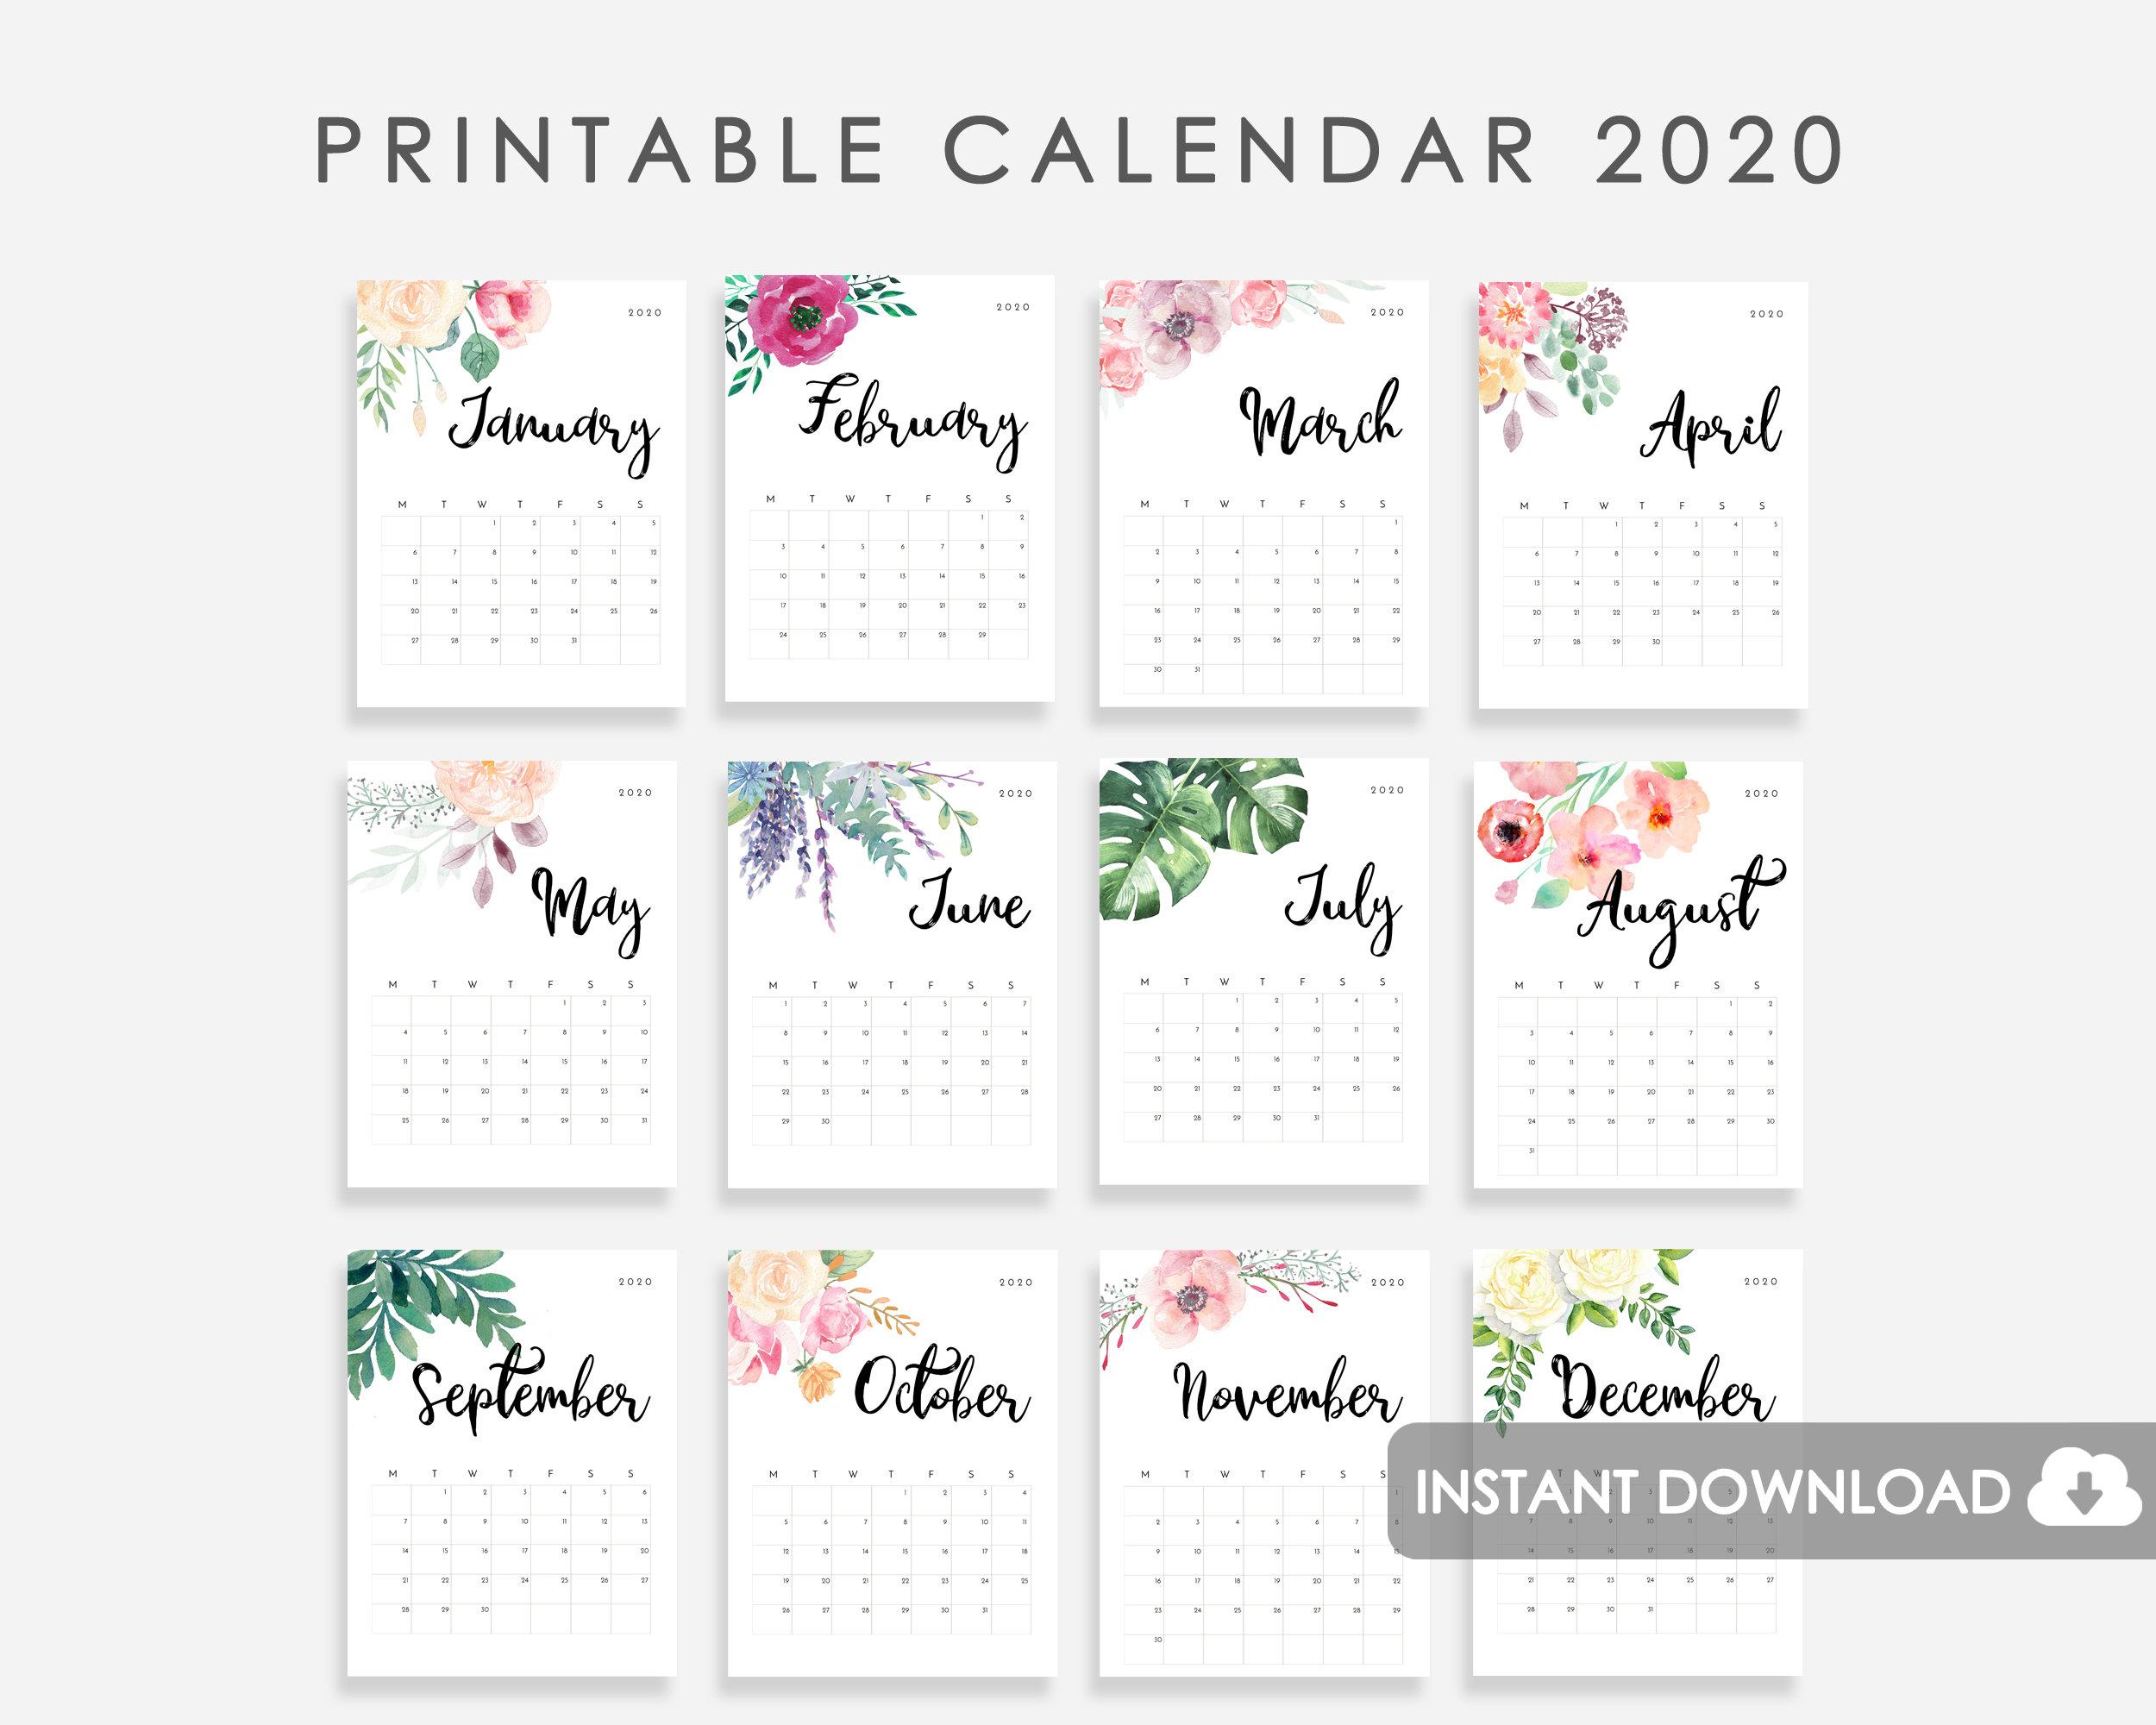 Календарь 2020 Г - Bagno.site